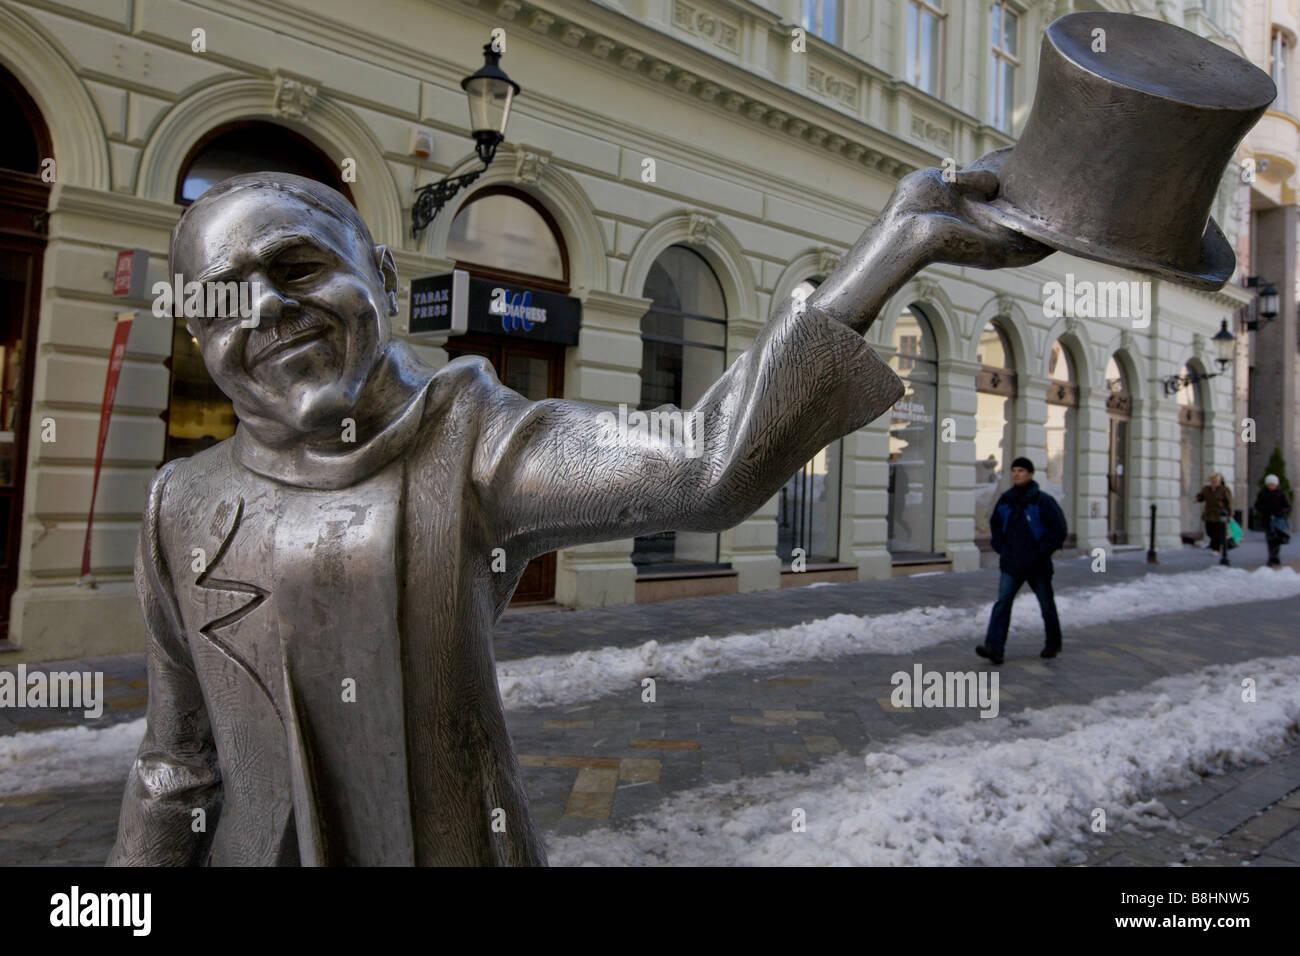 Schone Naci Statue in Bratislava, Slovakia. - Stock Image